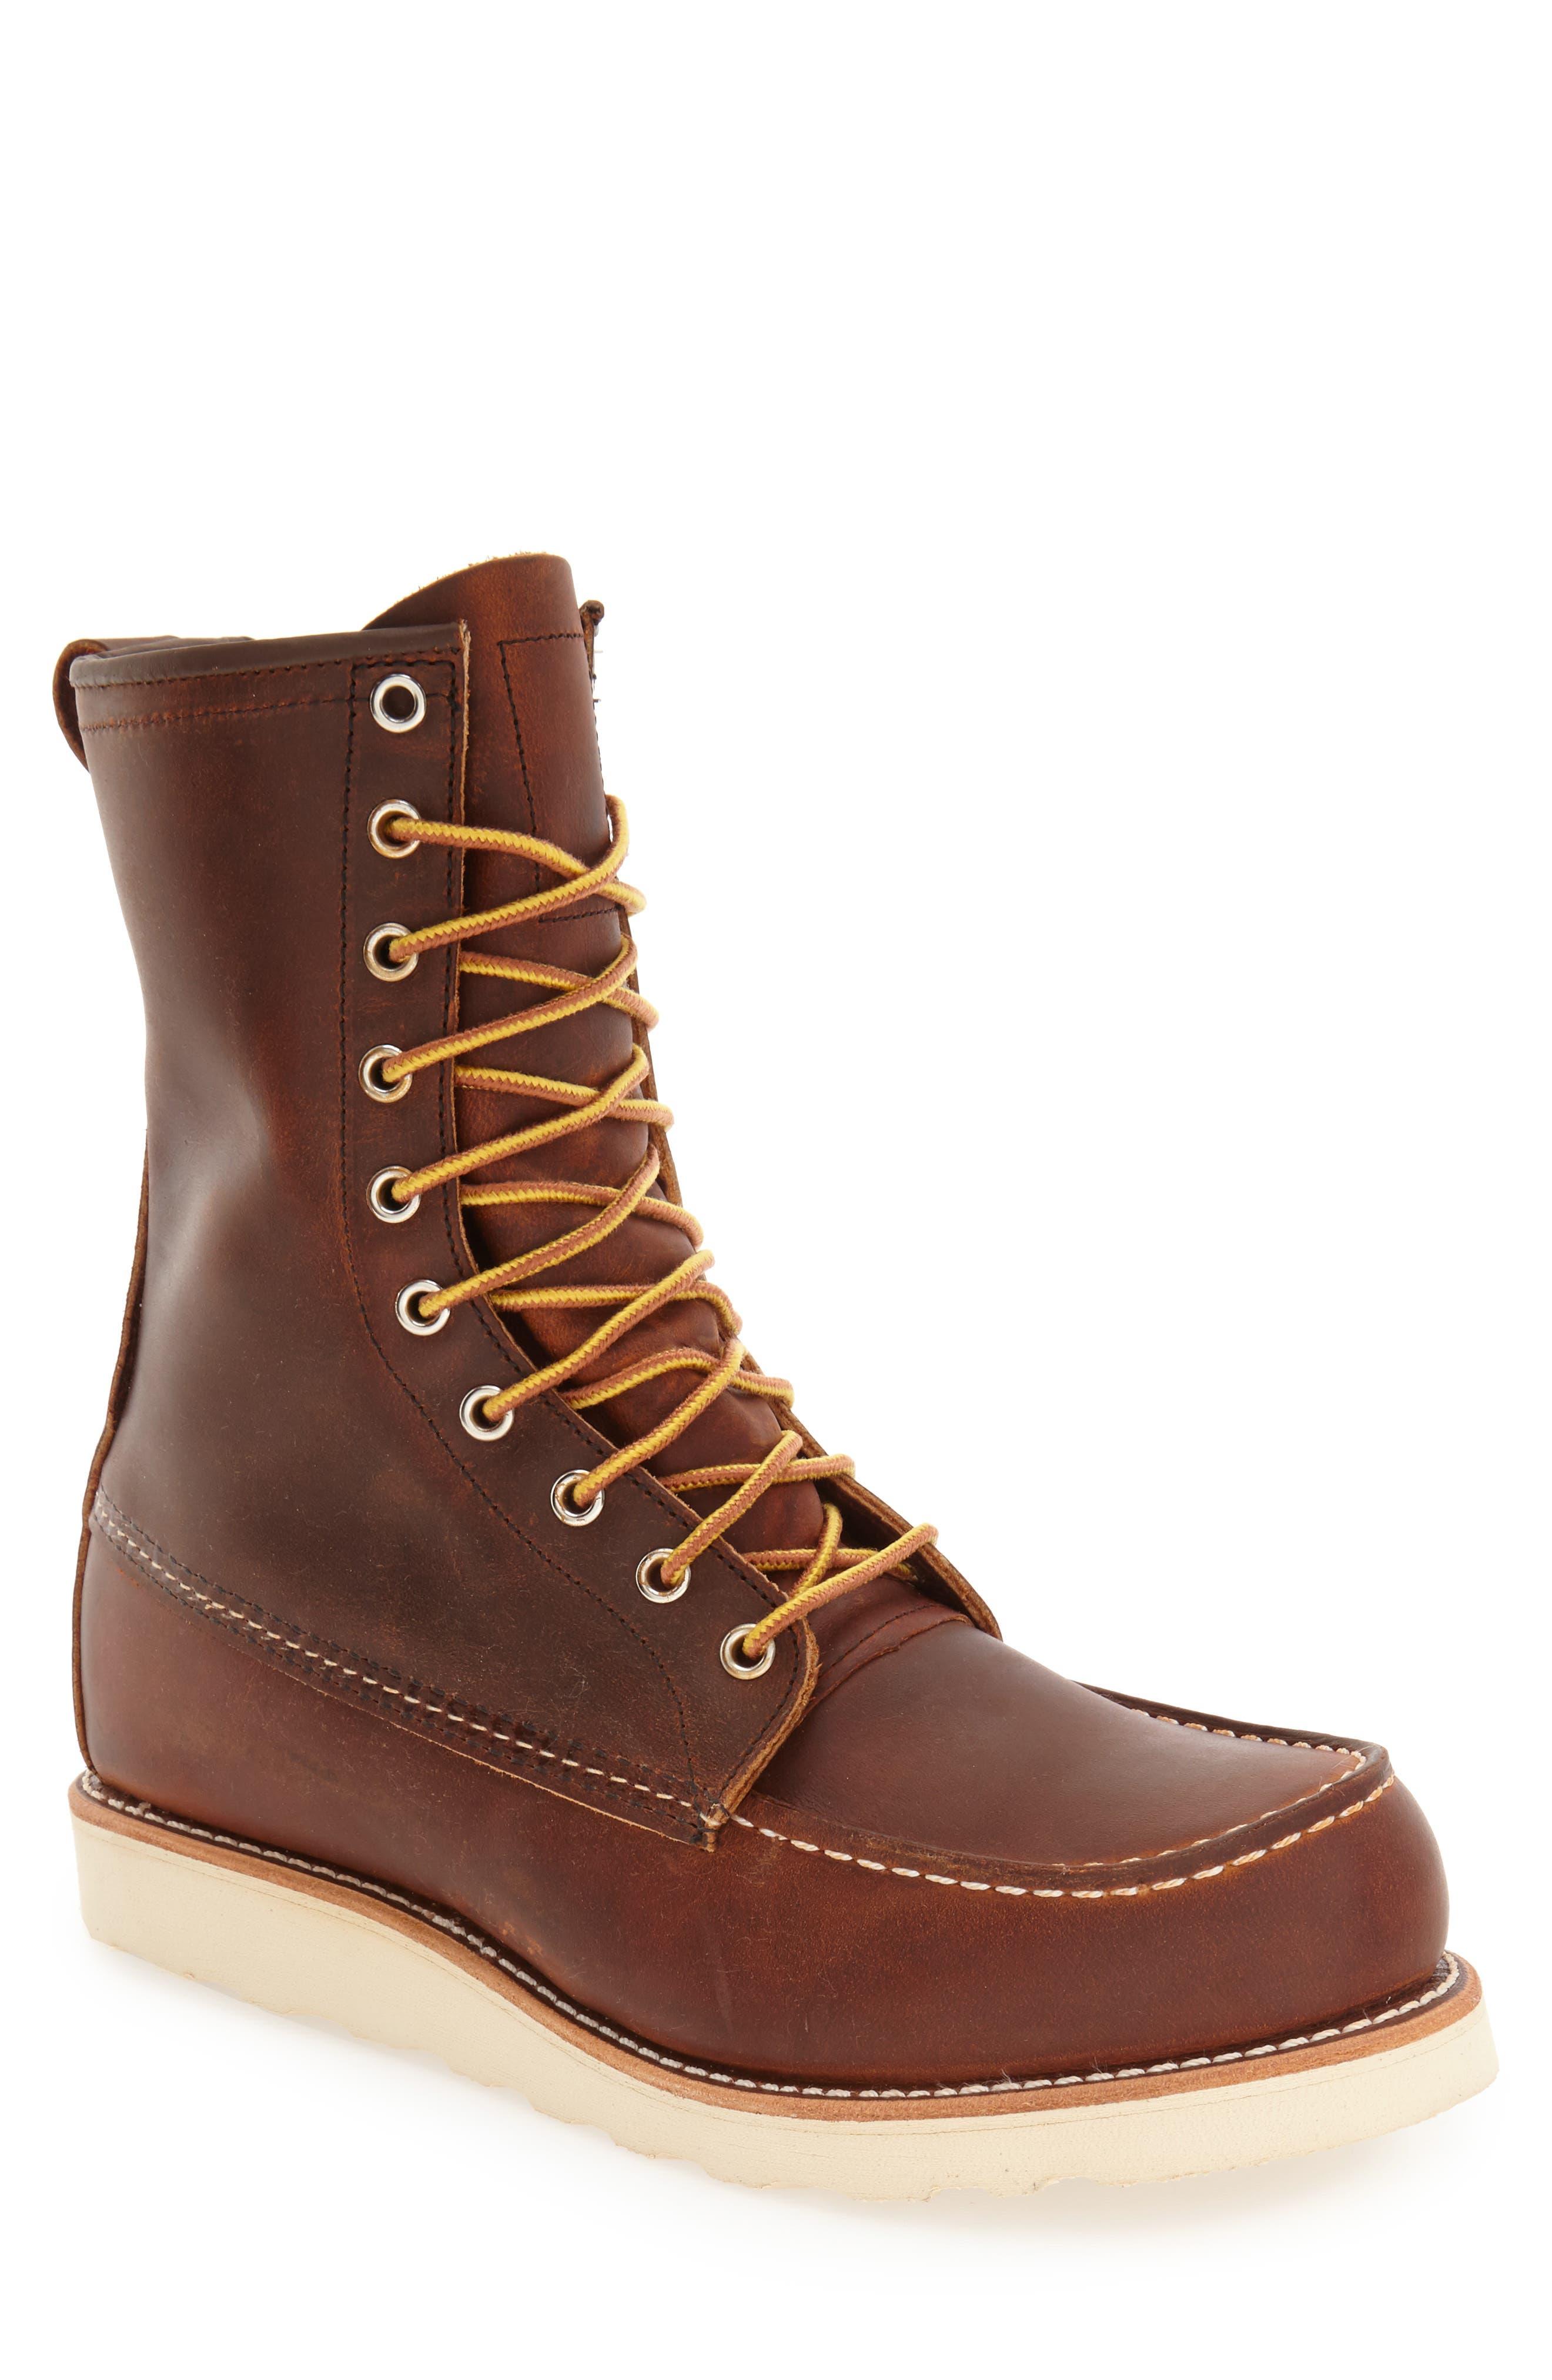 '877' Moc Toe Boot, Main, color, COPPER LEATHER